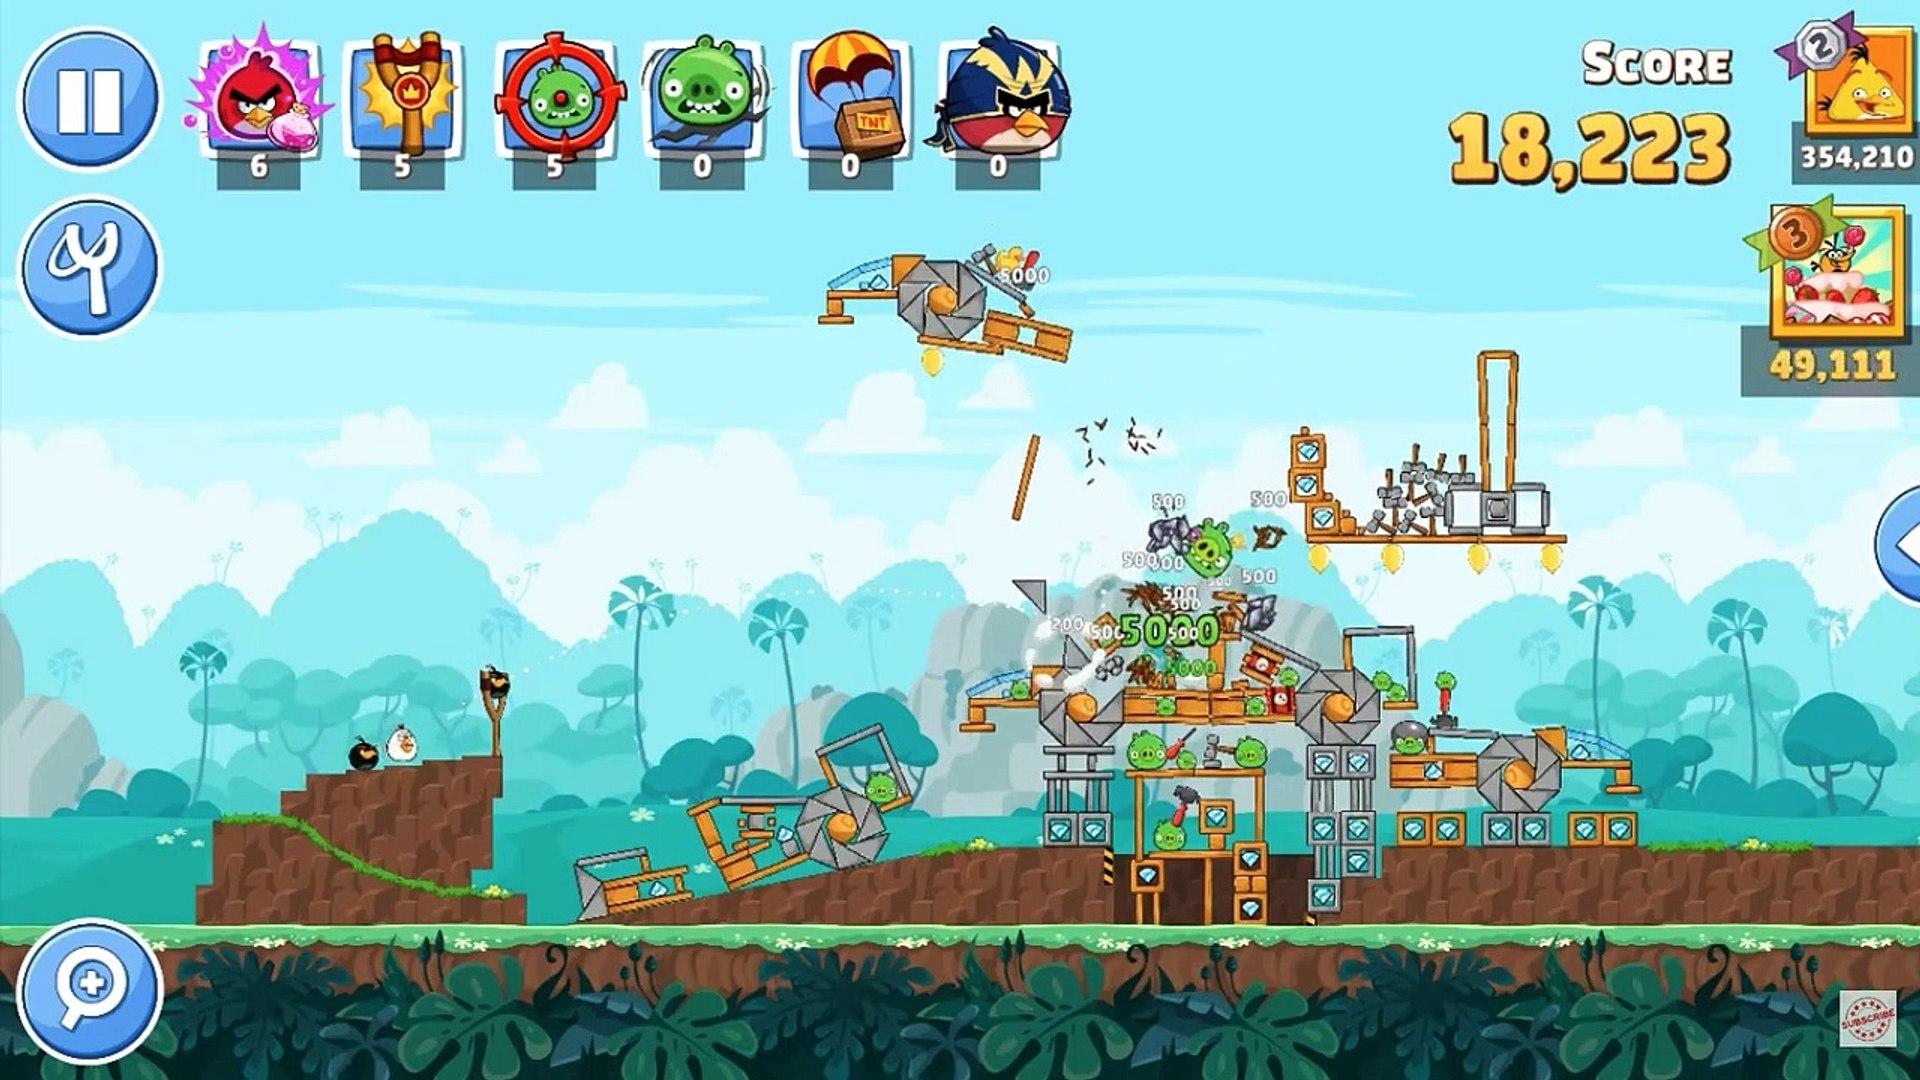 Angry Birds Friends - Gameplay Walkthrough part 2 - Angry Birds Friends - Procédure pas à pas de gam